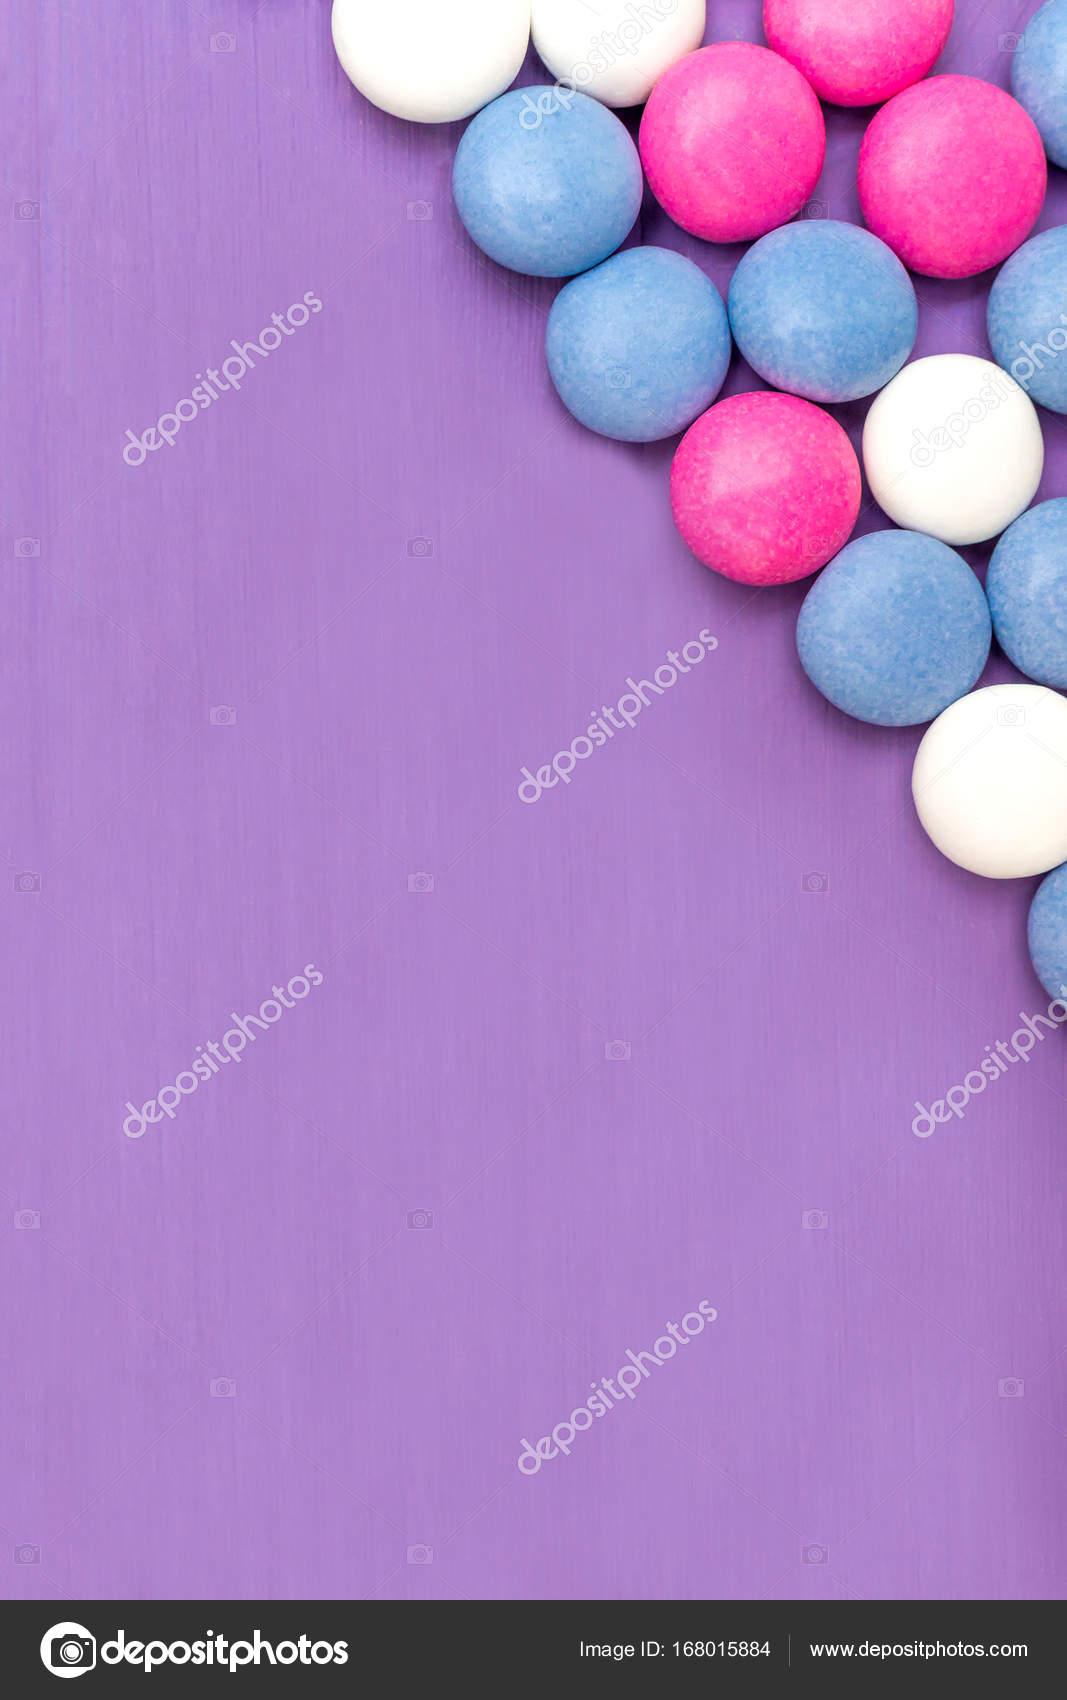 Oberen rechten Ecke Rahmen farbig beschichteten Praline — Stockfoto ...